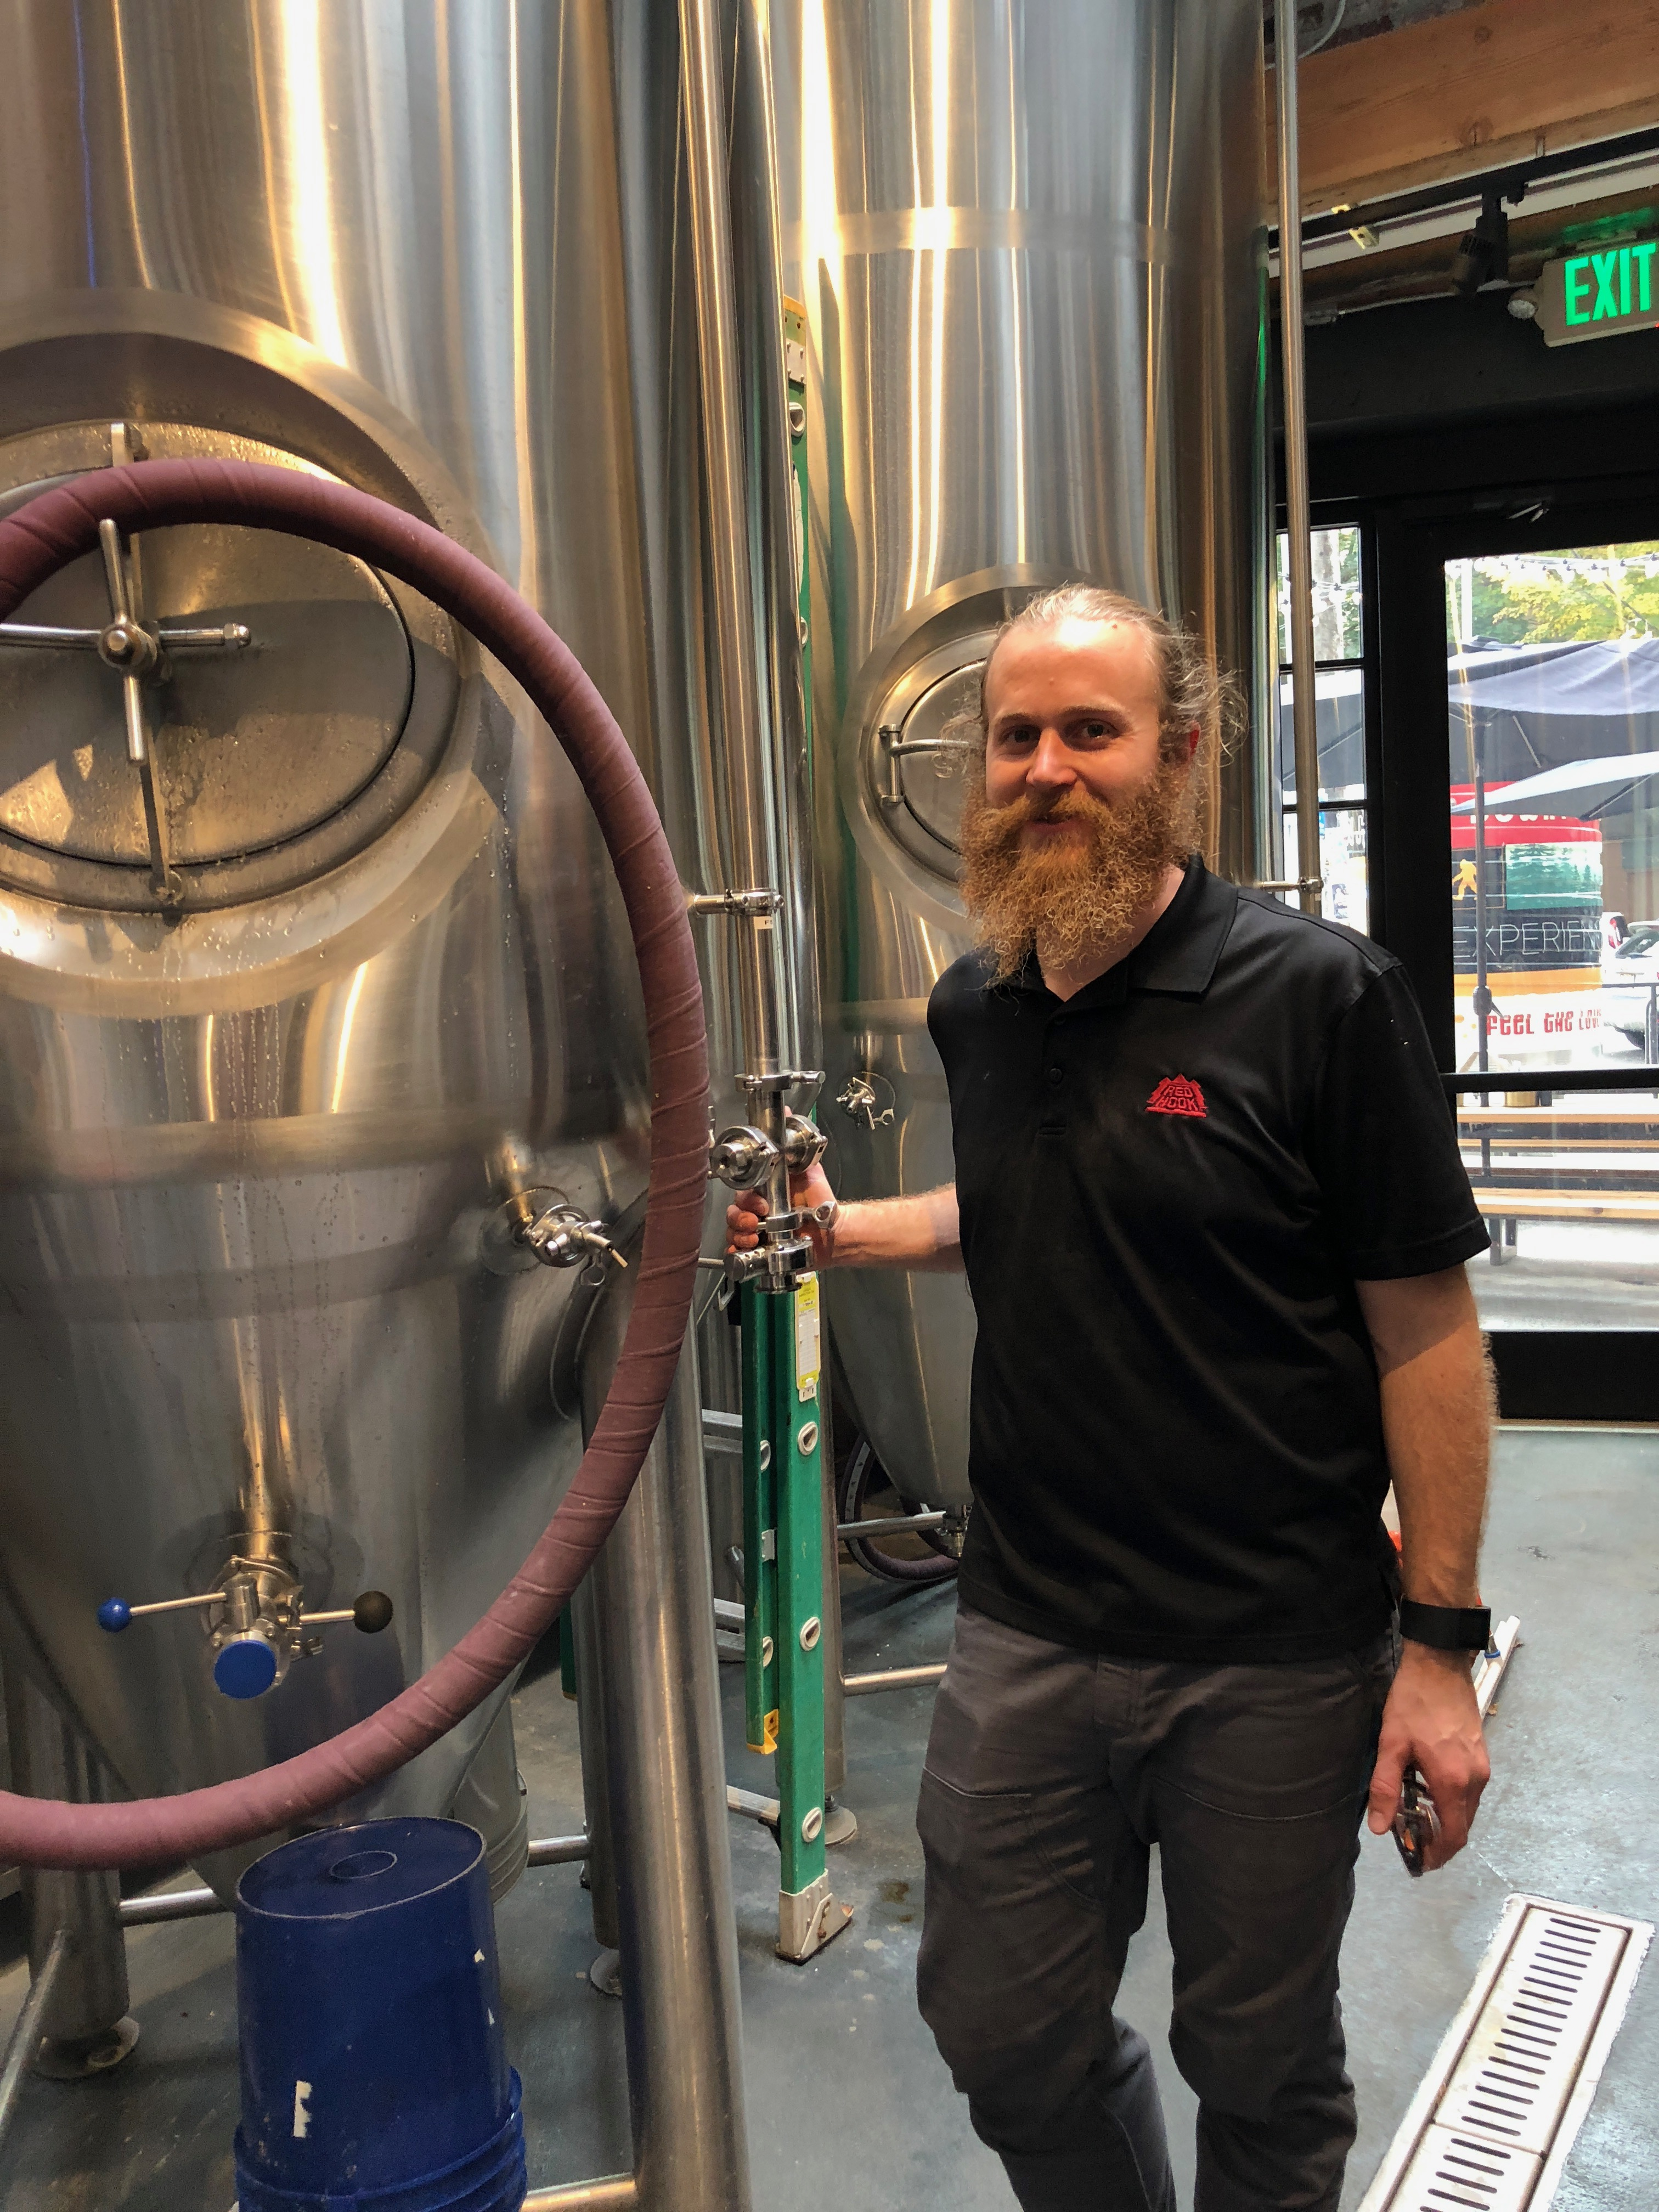 Nick Crandall, Head Brewer at Redhook BrewLab in Seattle.